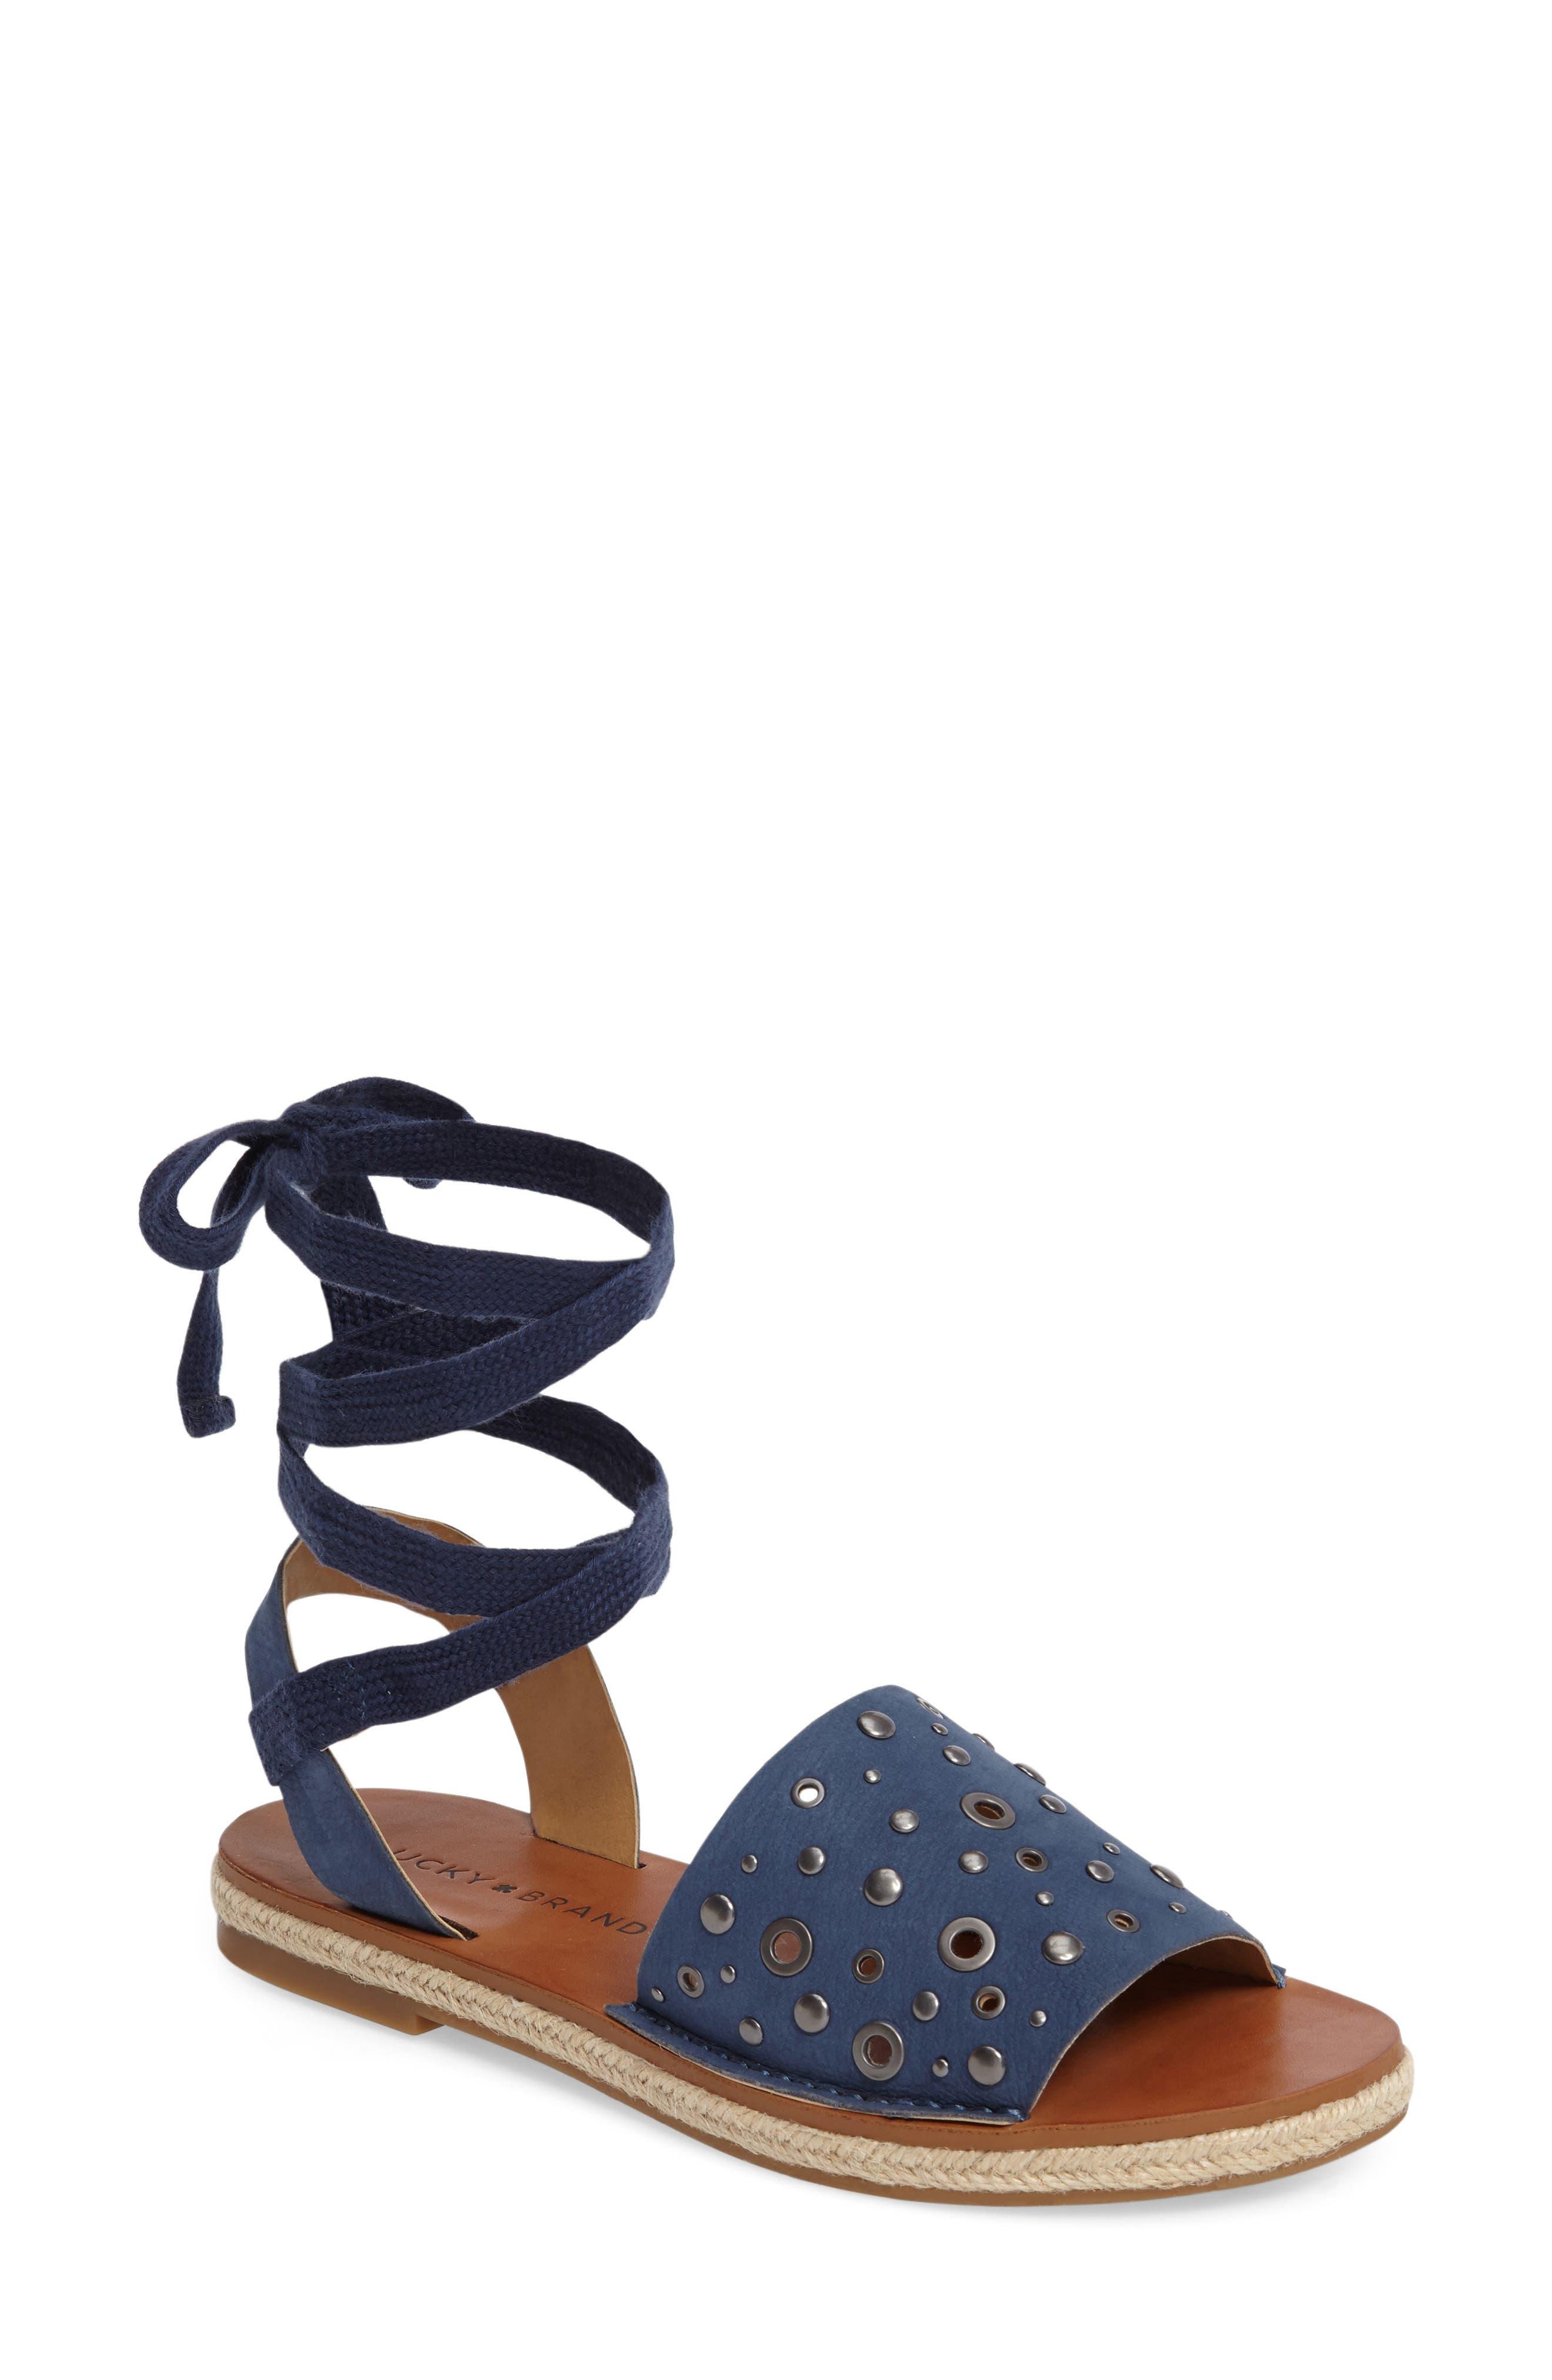 LUCKY BRAND Daytah Ankle Tie Sandal